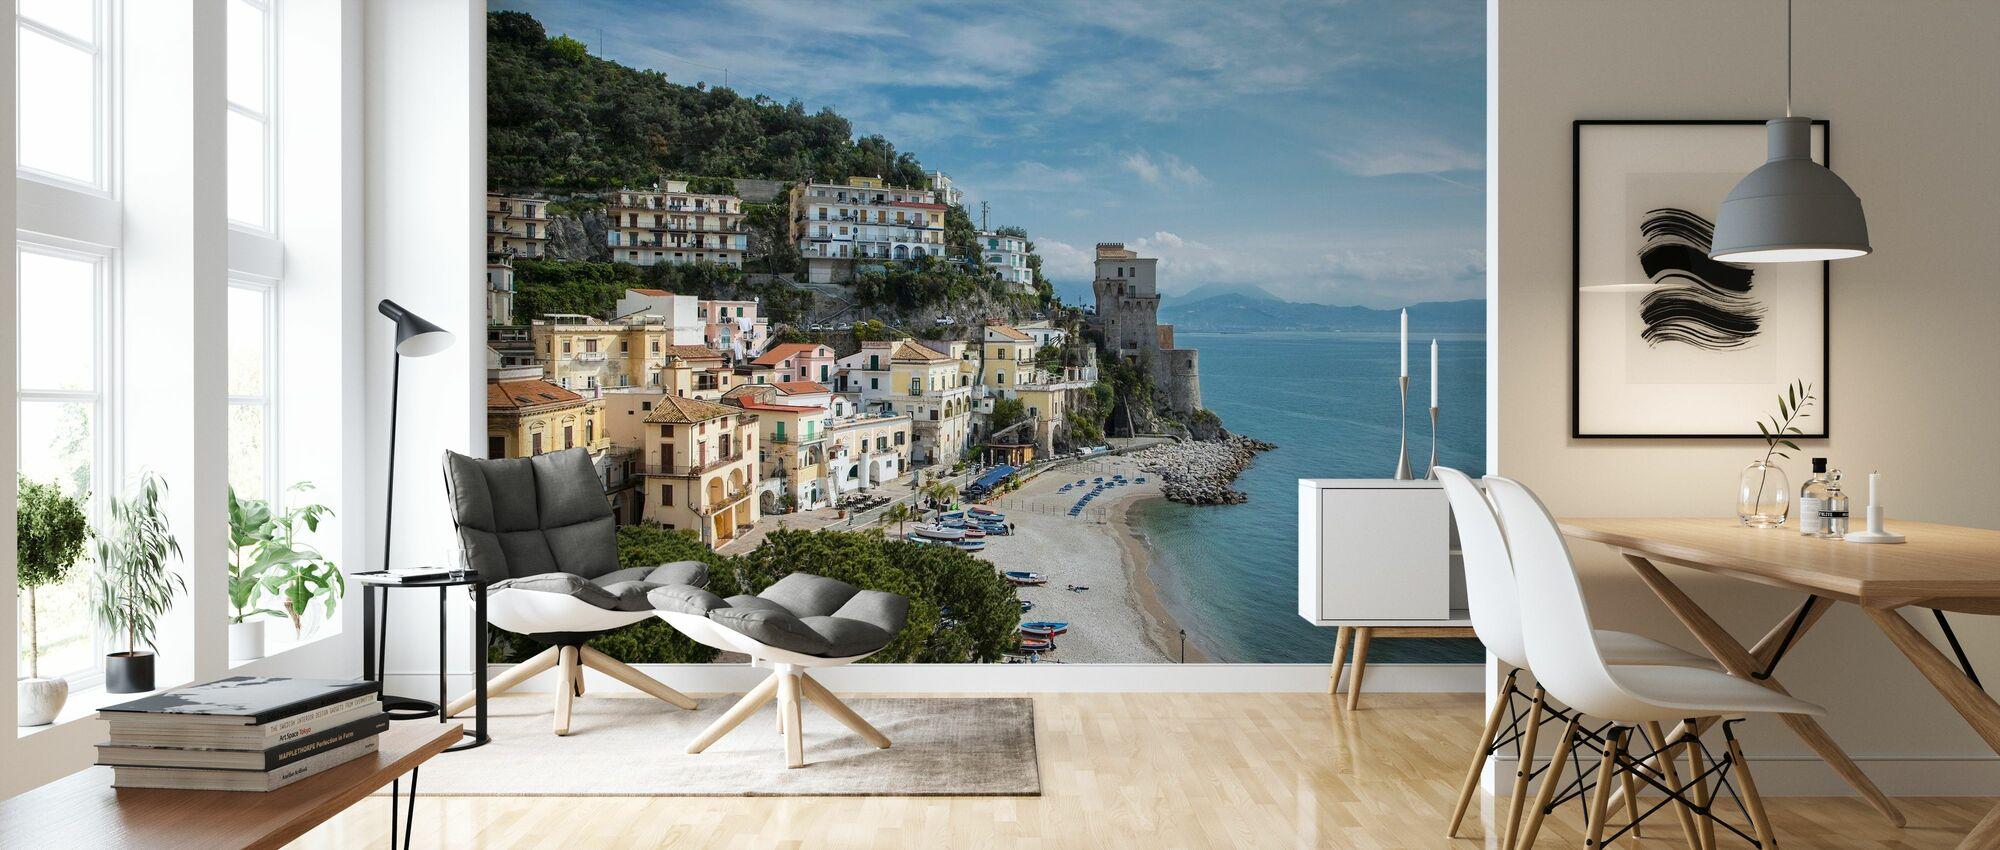 Amalfi Coast - Wallpaper - Living Room